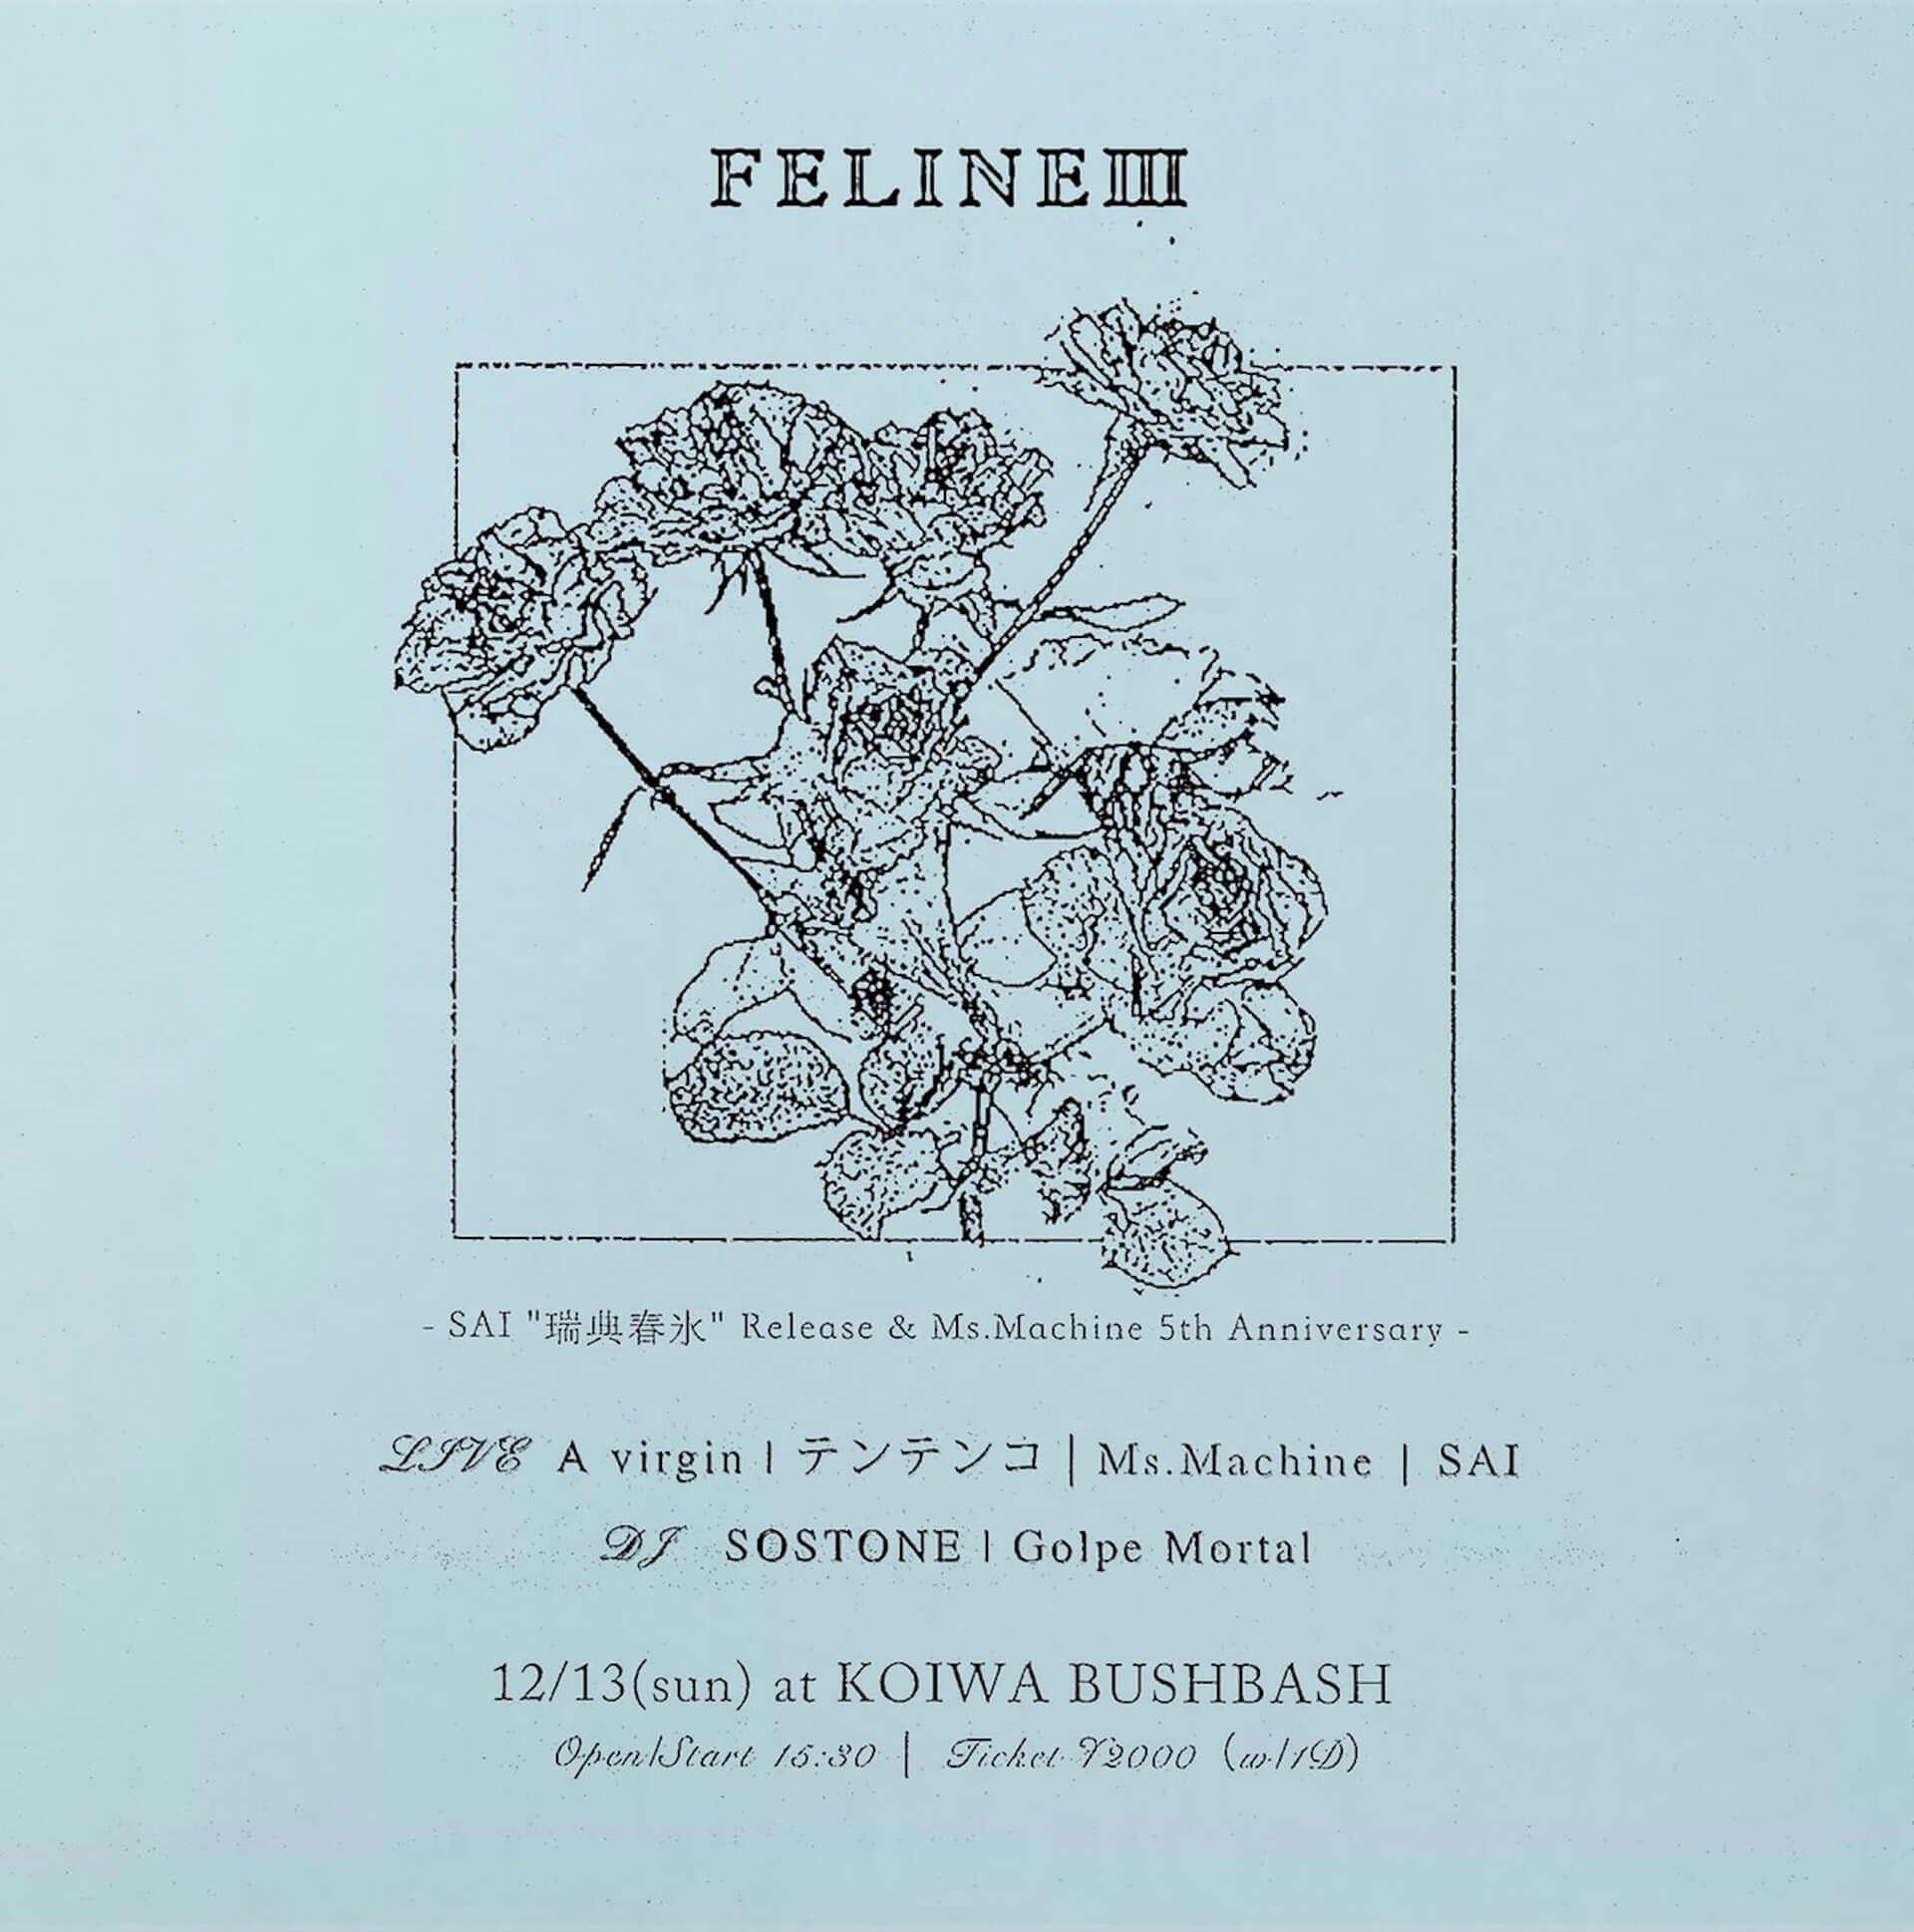 Ms.MachineのSAIが音源集『瑞典春氷』をCDでリリース決定!小岩BushBashでのリリースパーティーにはテンテンコらが出演 music201130_sai_2-1920x1938